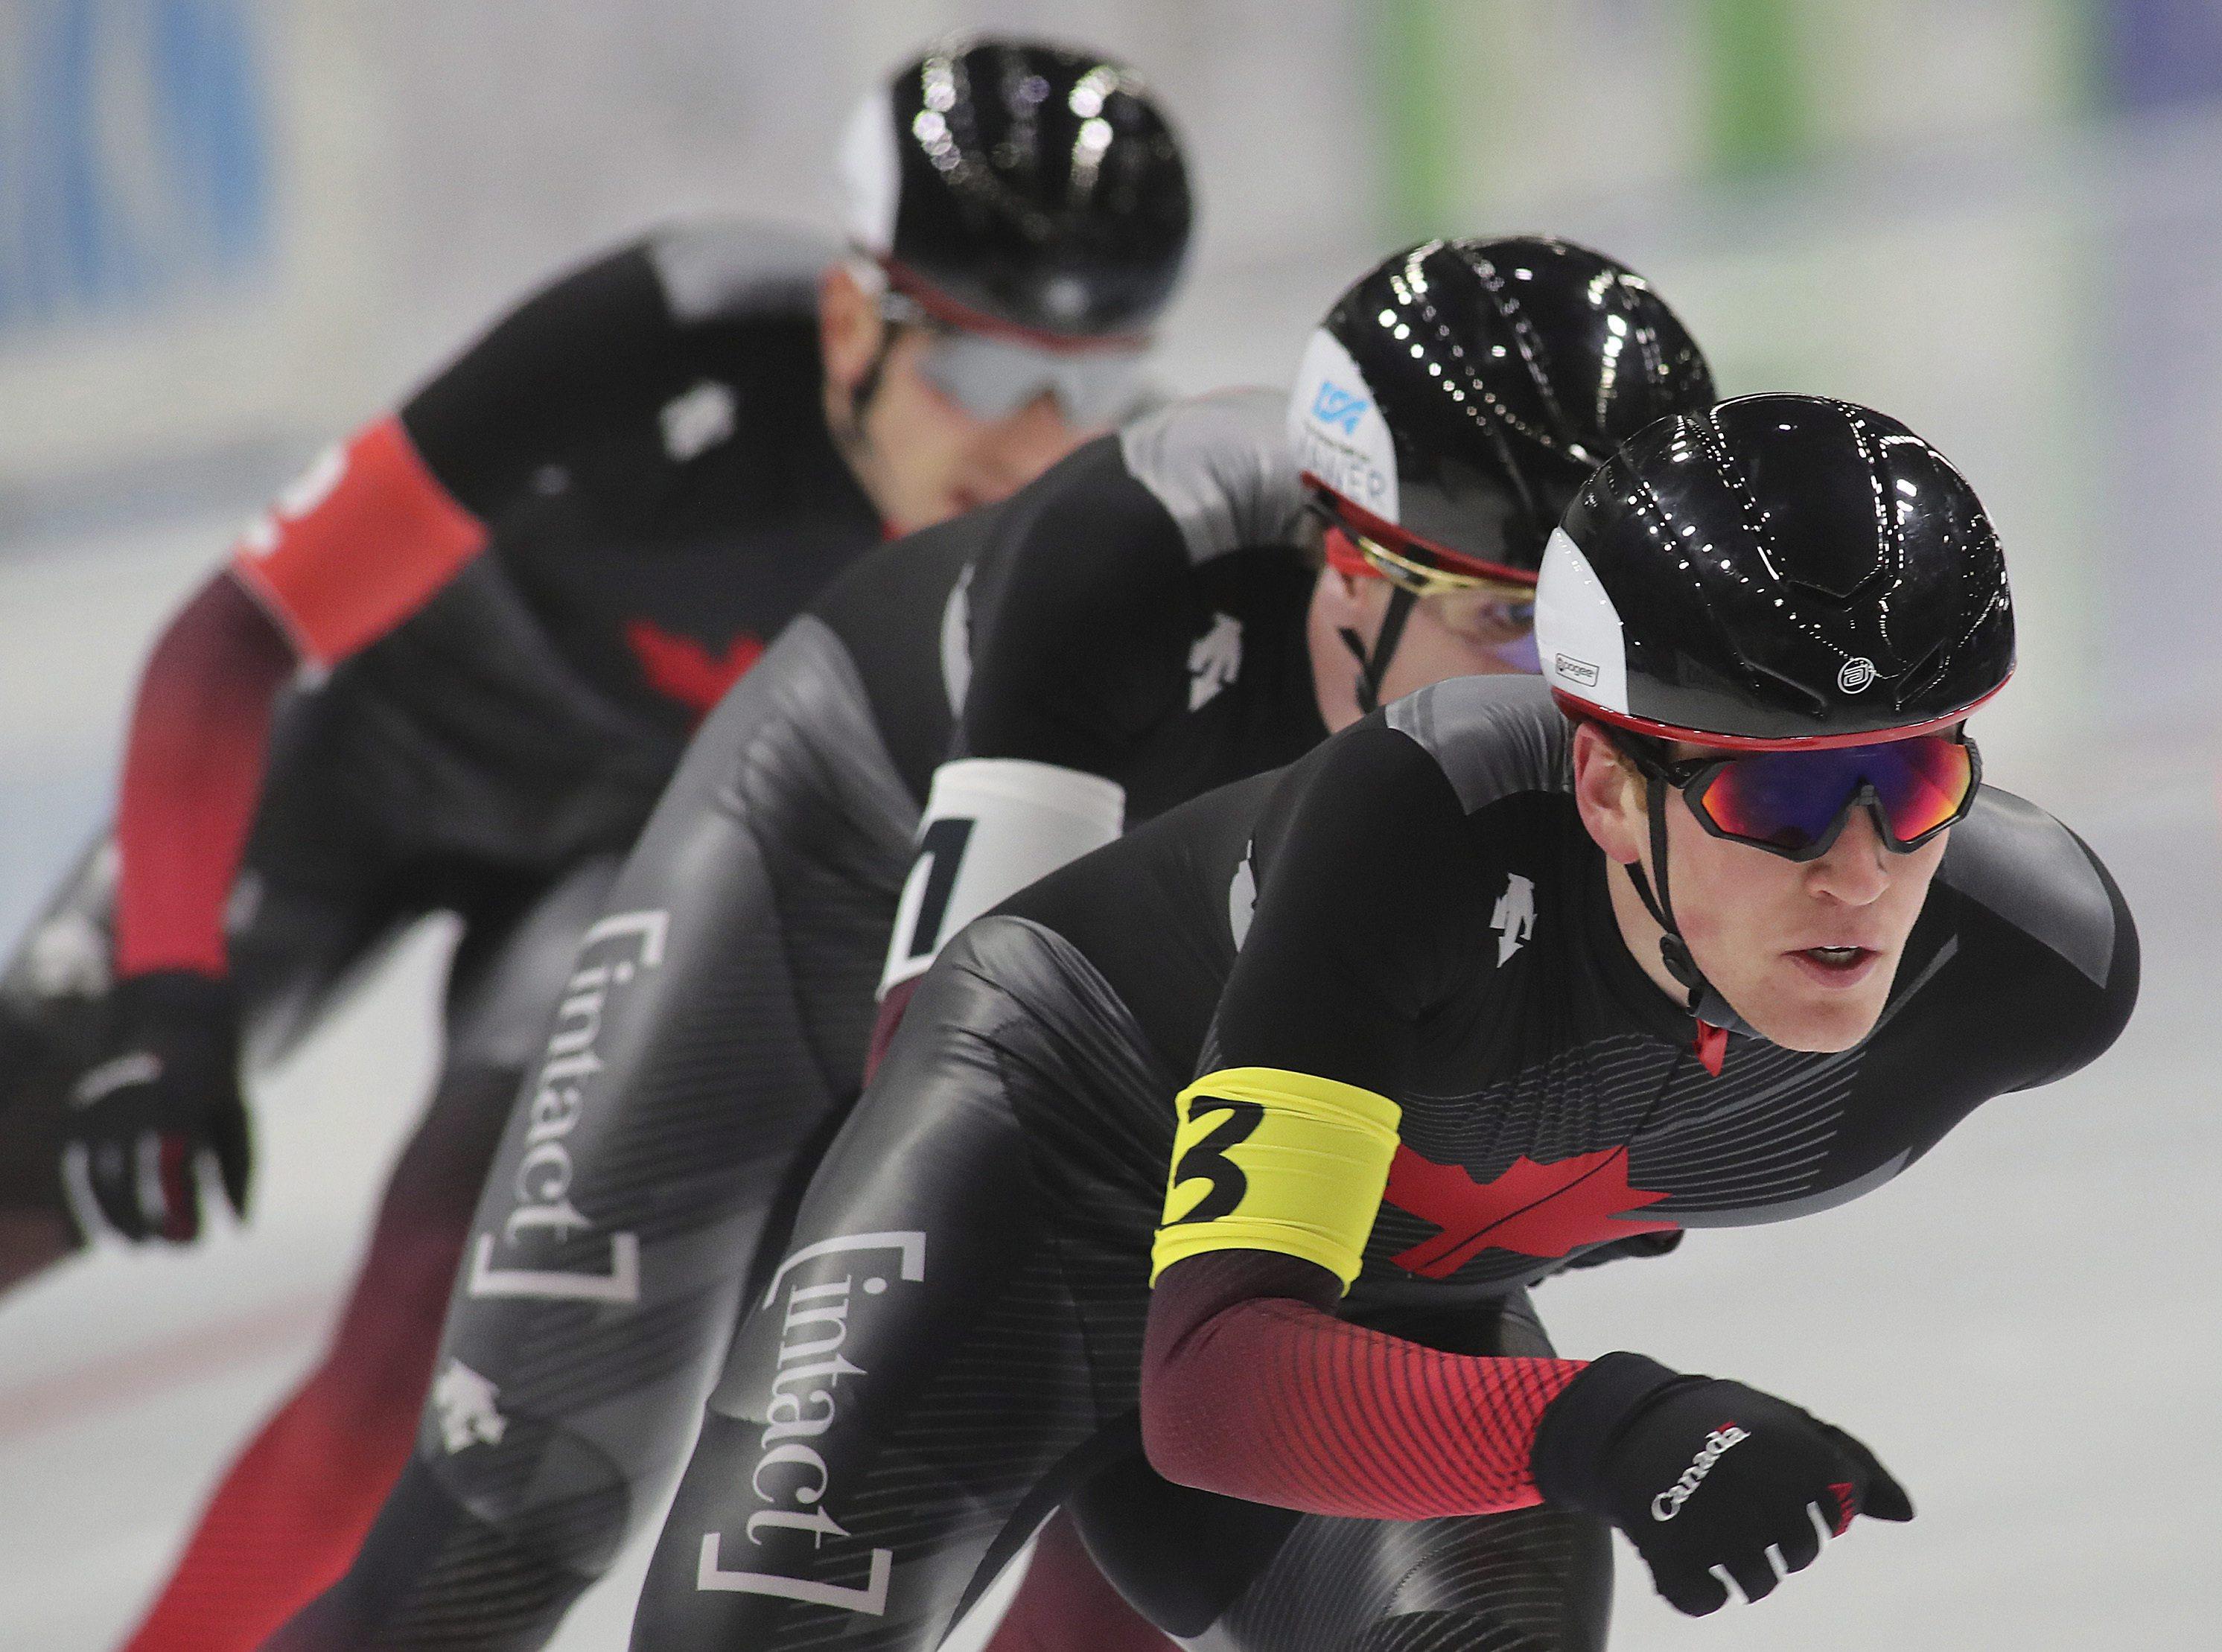 Canada's team in action during the men's team race of ISU Speedskating World Cup in Tomaszow Mazowiecki, Poland, Sunday , Nov. 24, 2019. (AP Photo/Marian Zubrzycki)